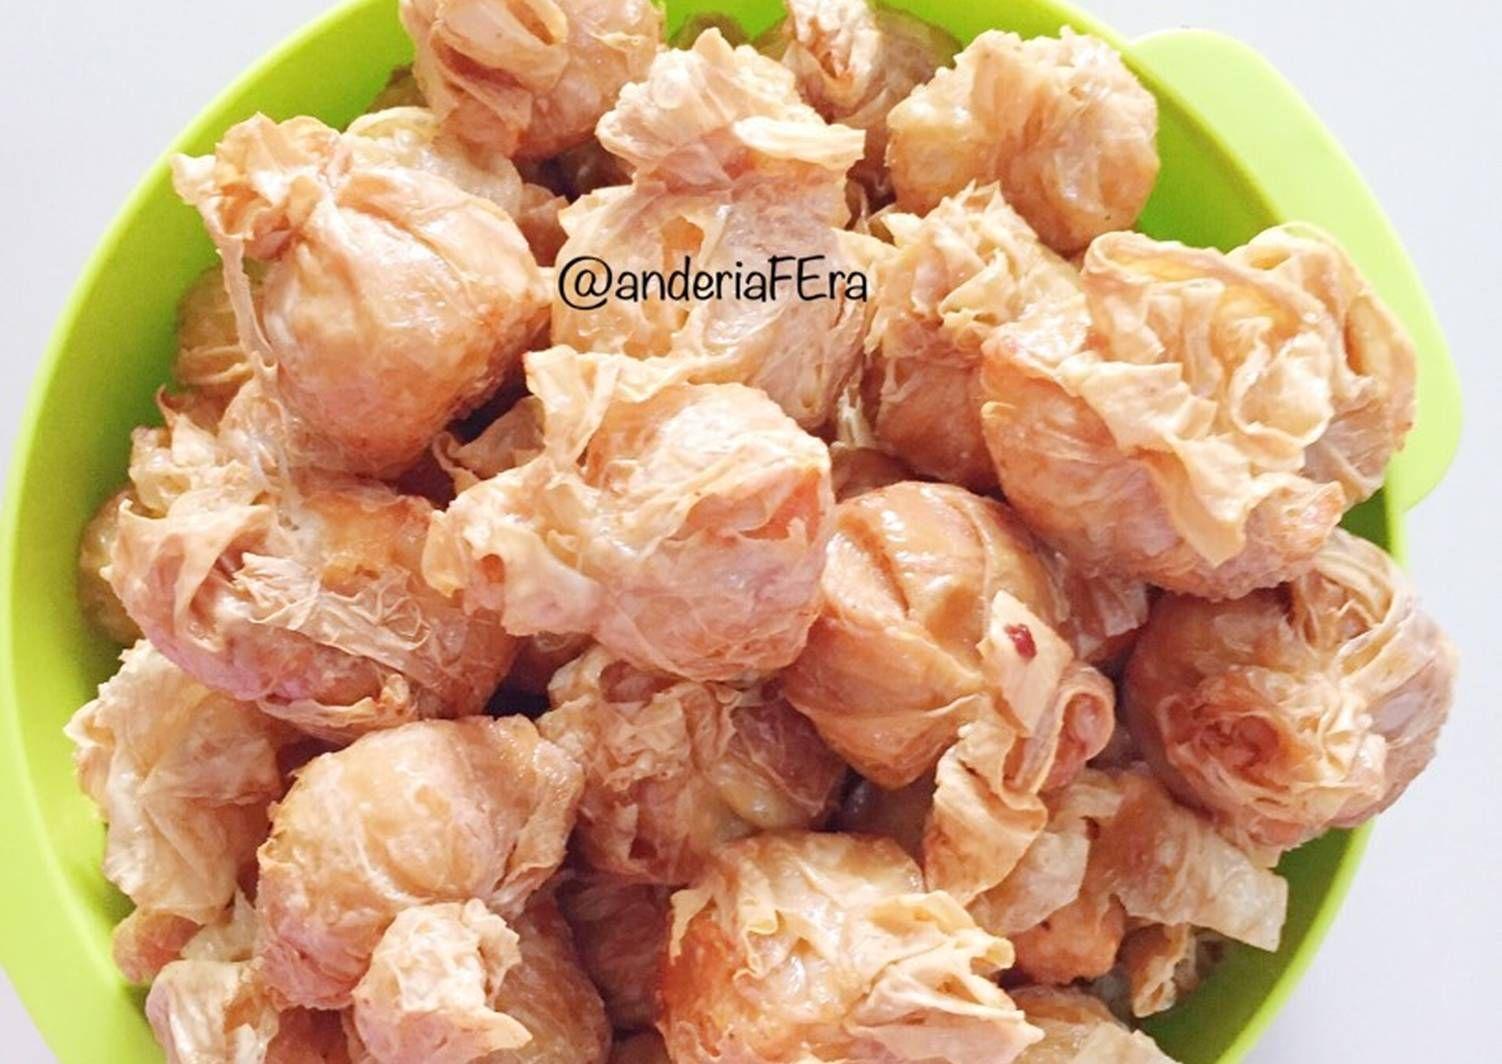 Resep Ekado Ala Hokben Oleh Anderia Fera Resep Resep Resep Masakan Masakan